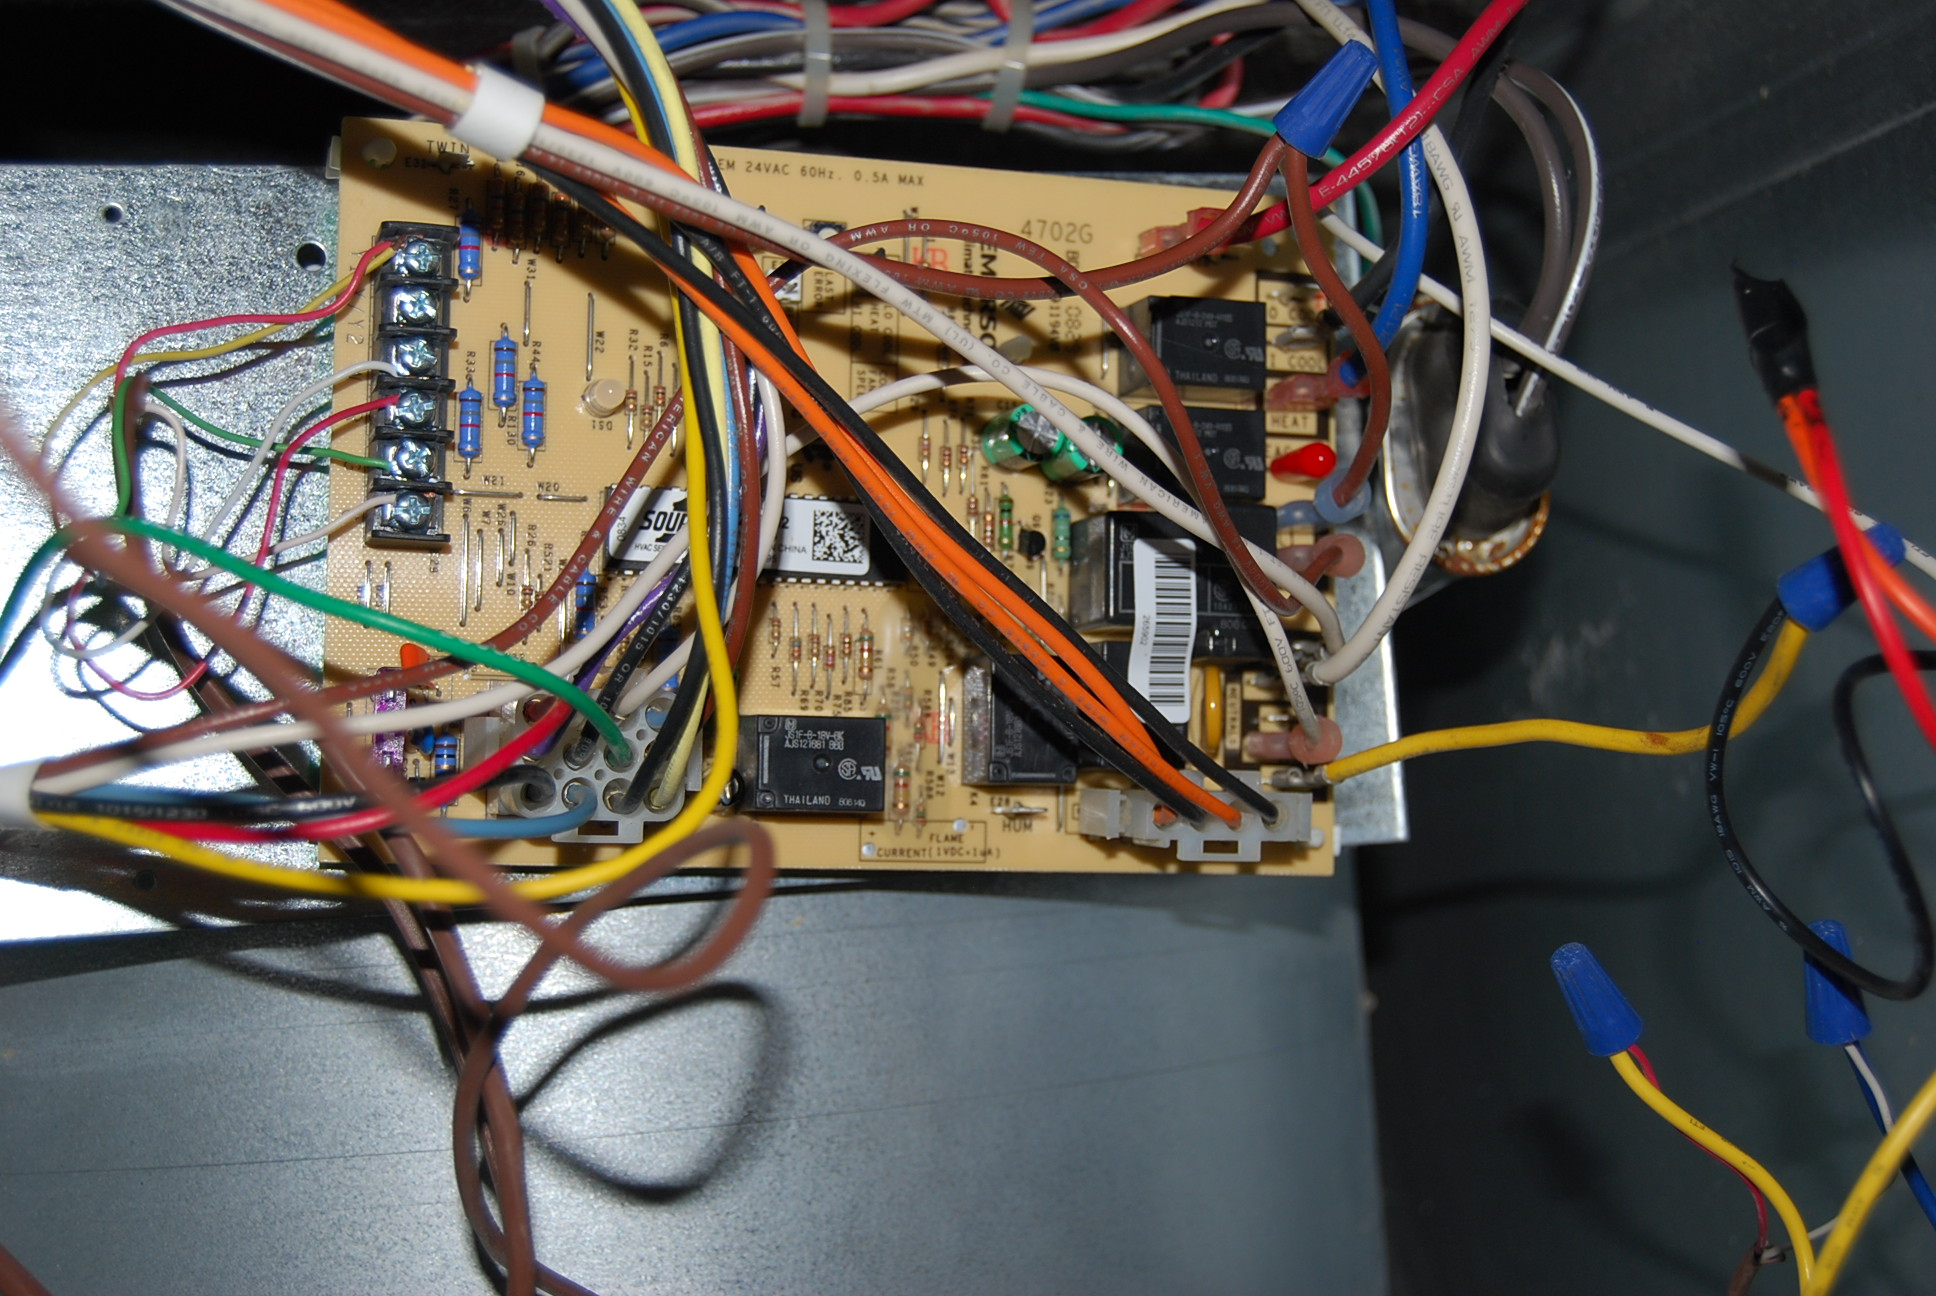 2010-05-26_224311_DSC_0218 York Diamond Blower Motor Wiring Diagram on york ac wiring diagram, york diamond 90 air cycler, york heat pump diagram, york wiring schematics, york heat pump thermostat wiring, york diamond 80 repair, york diamond 80 transformer, york thermostat wiring diagram, york diamond 90 parts, gas furnace diagram,